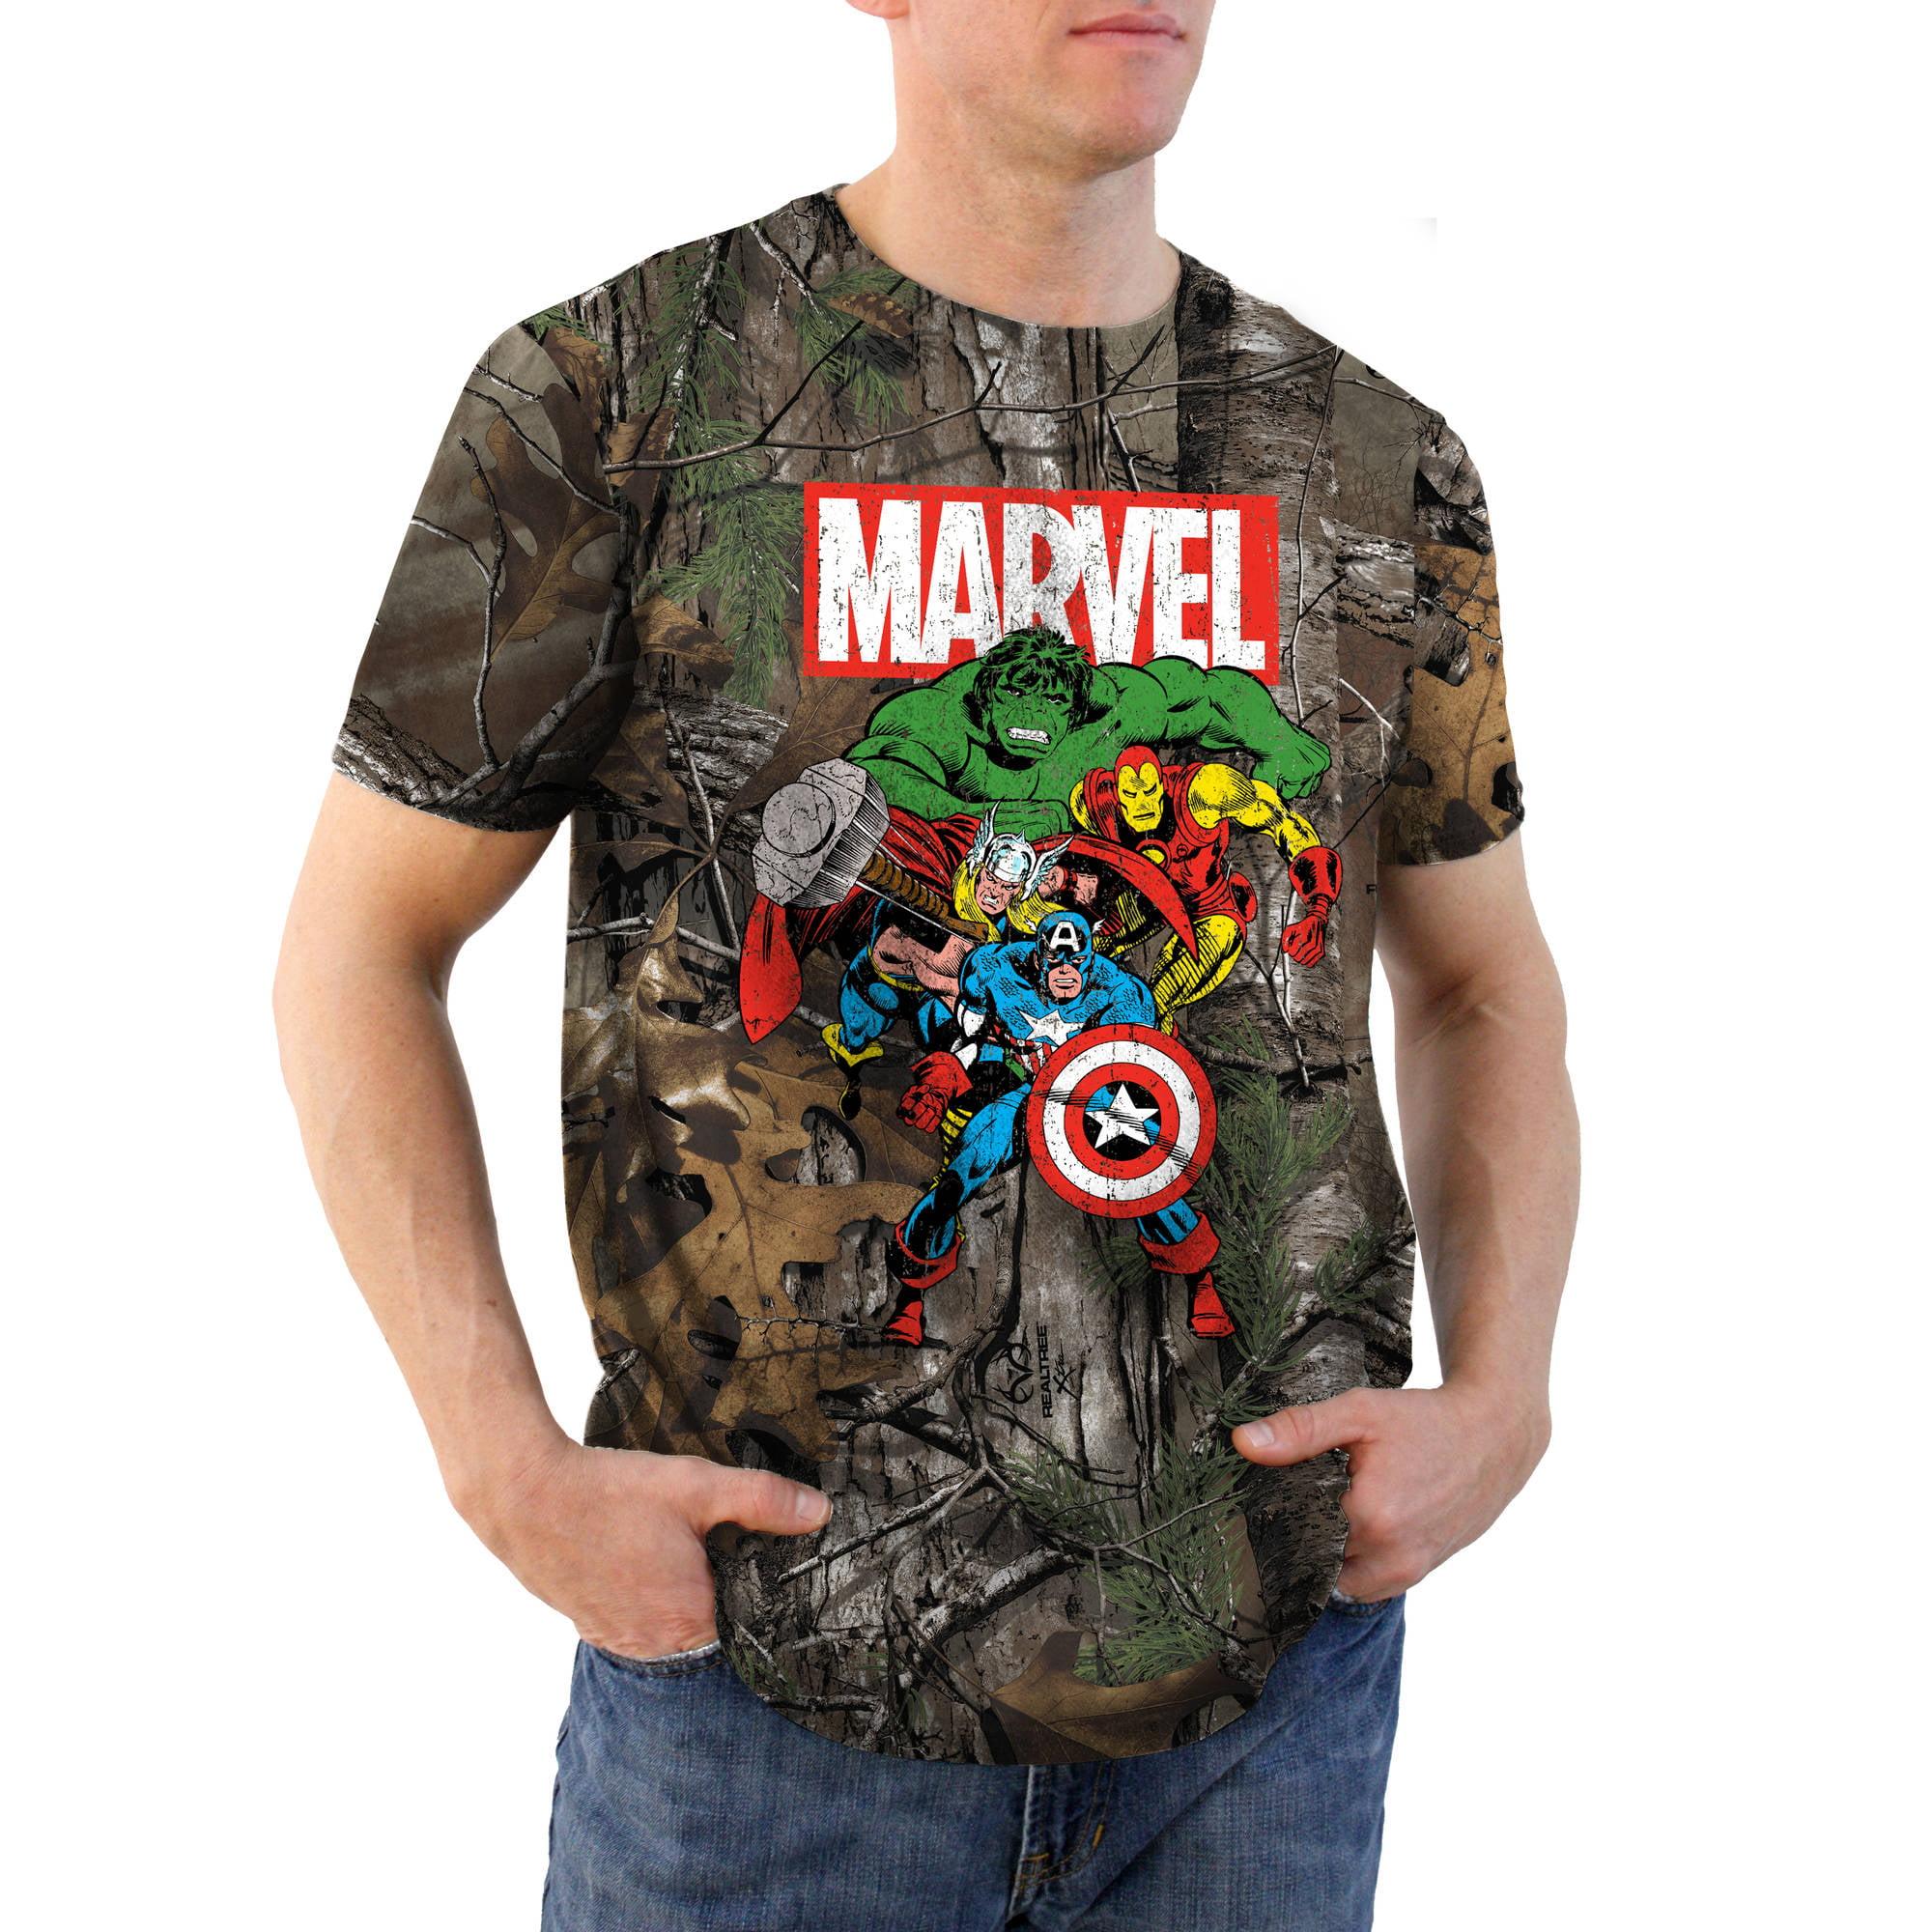 Avengers Title Realtree Camo Big Men's Graphic Tee, 2XL